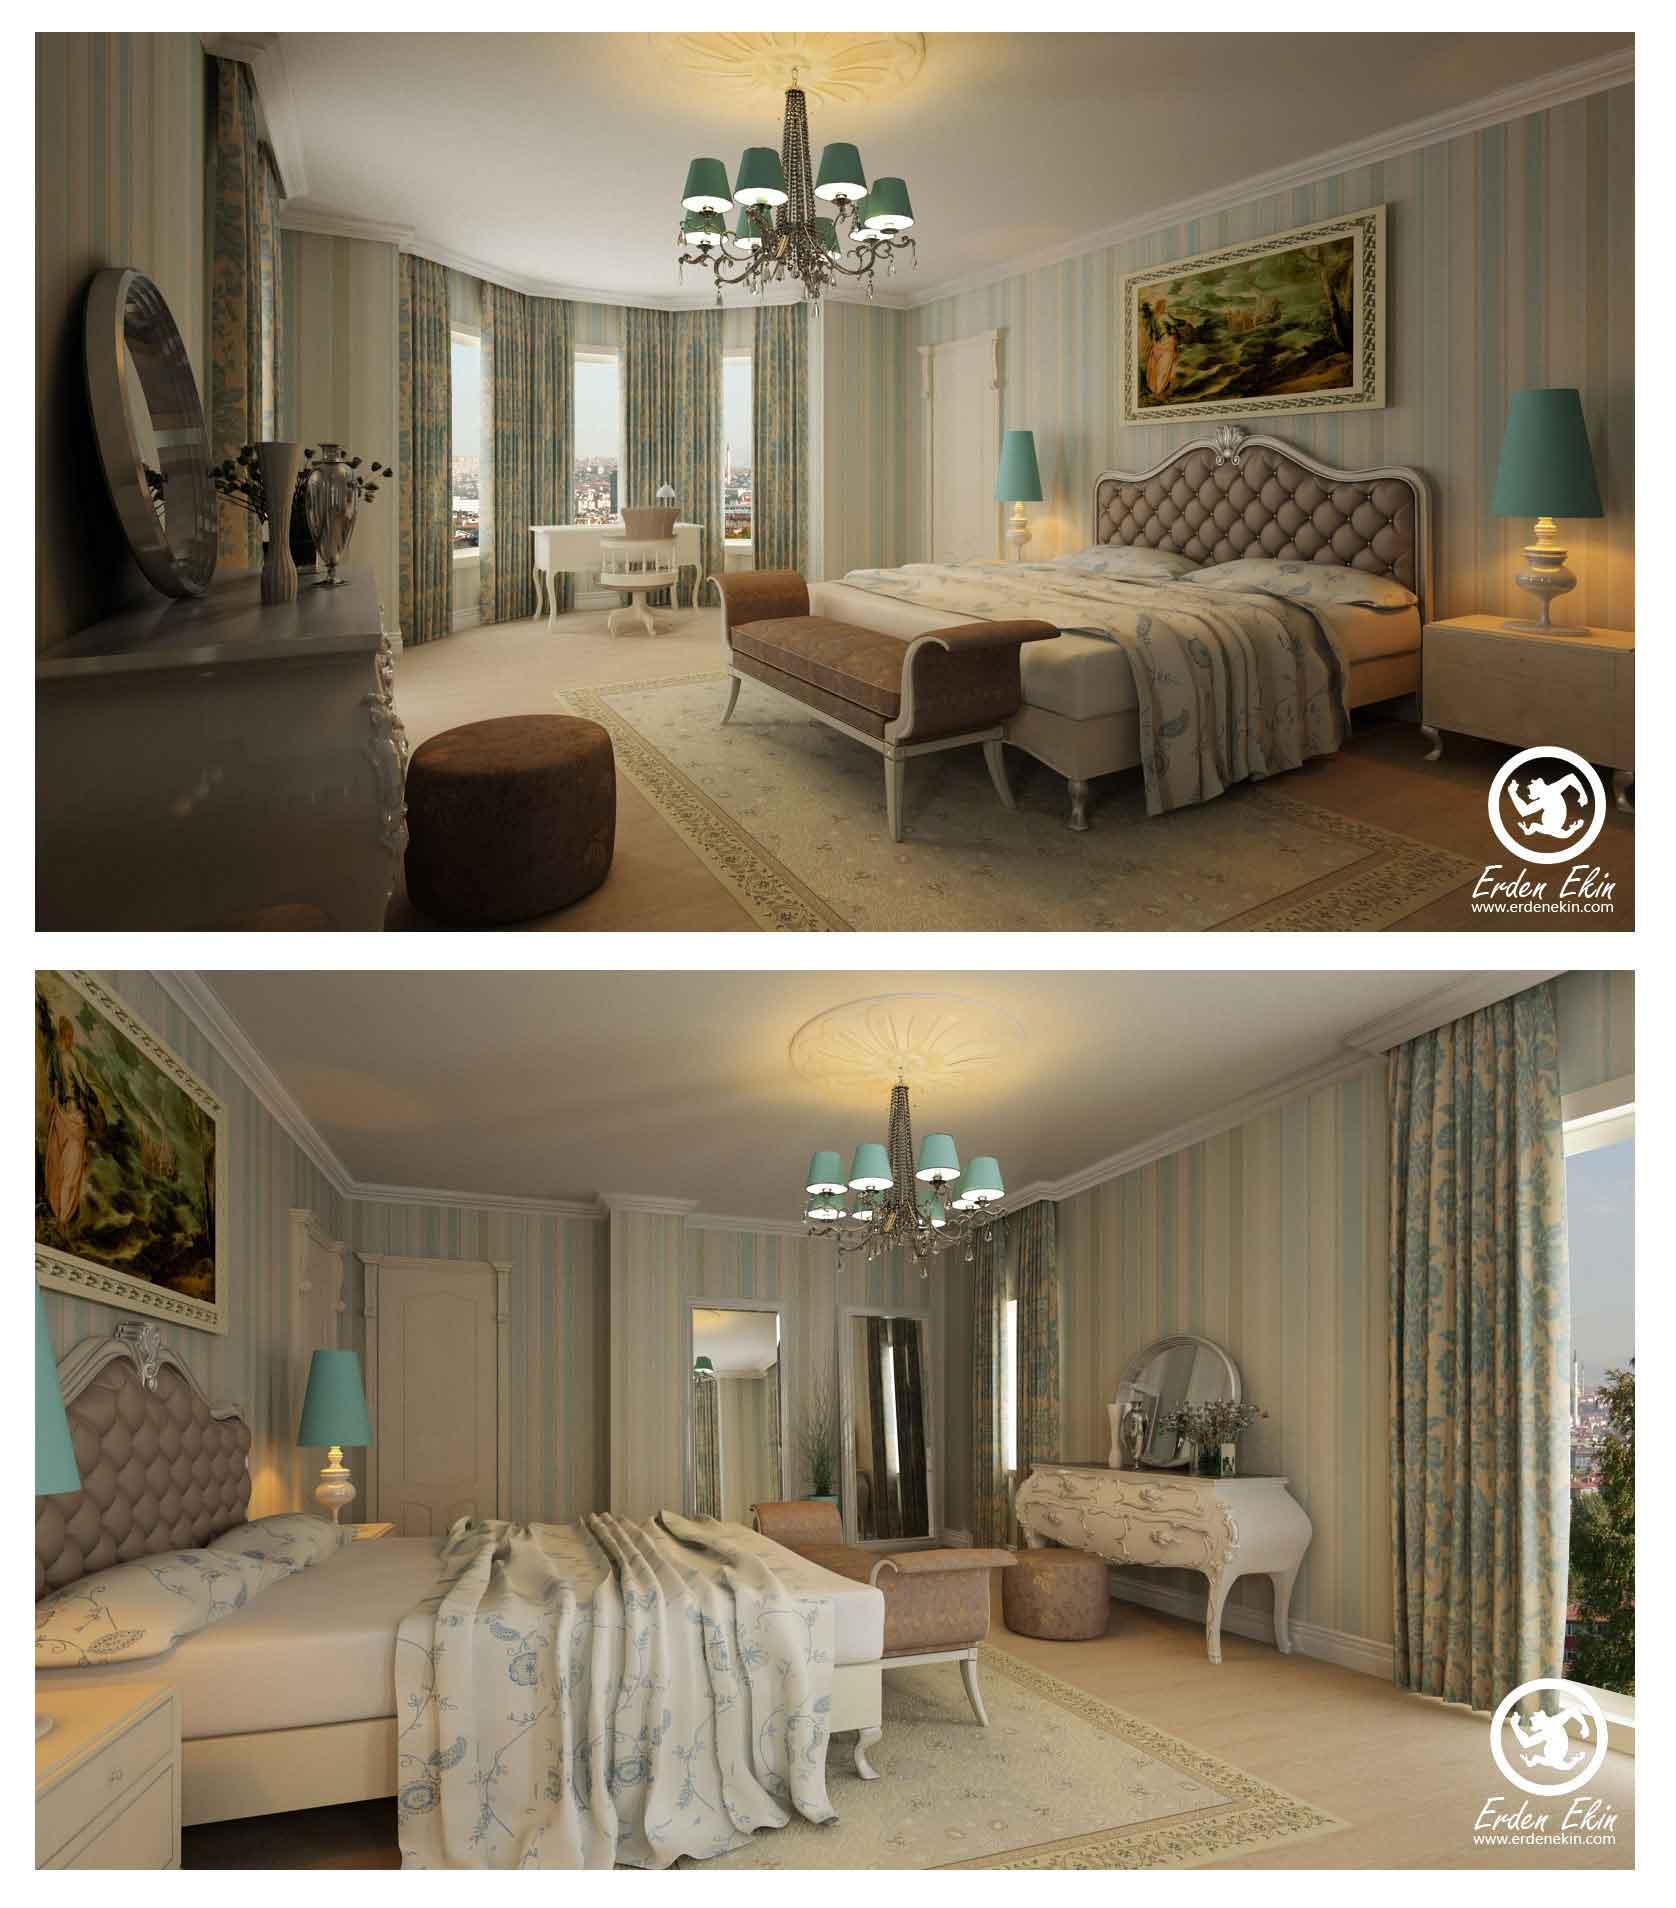 Yatak Odasi Beautiful Bedroom With Teal Accents Stripe Wallpaper Interior Design Ideas